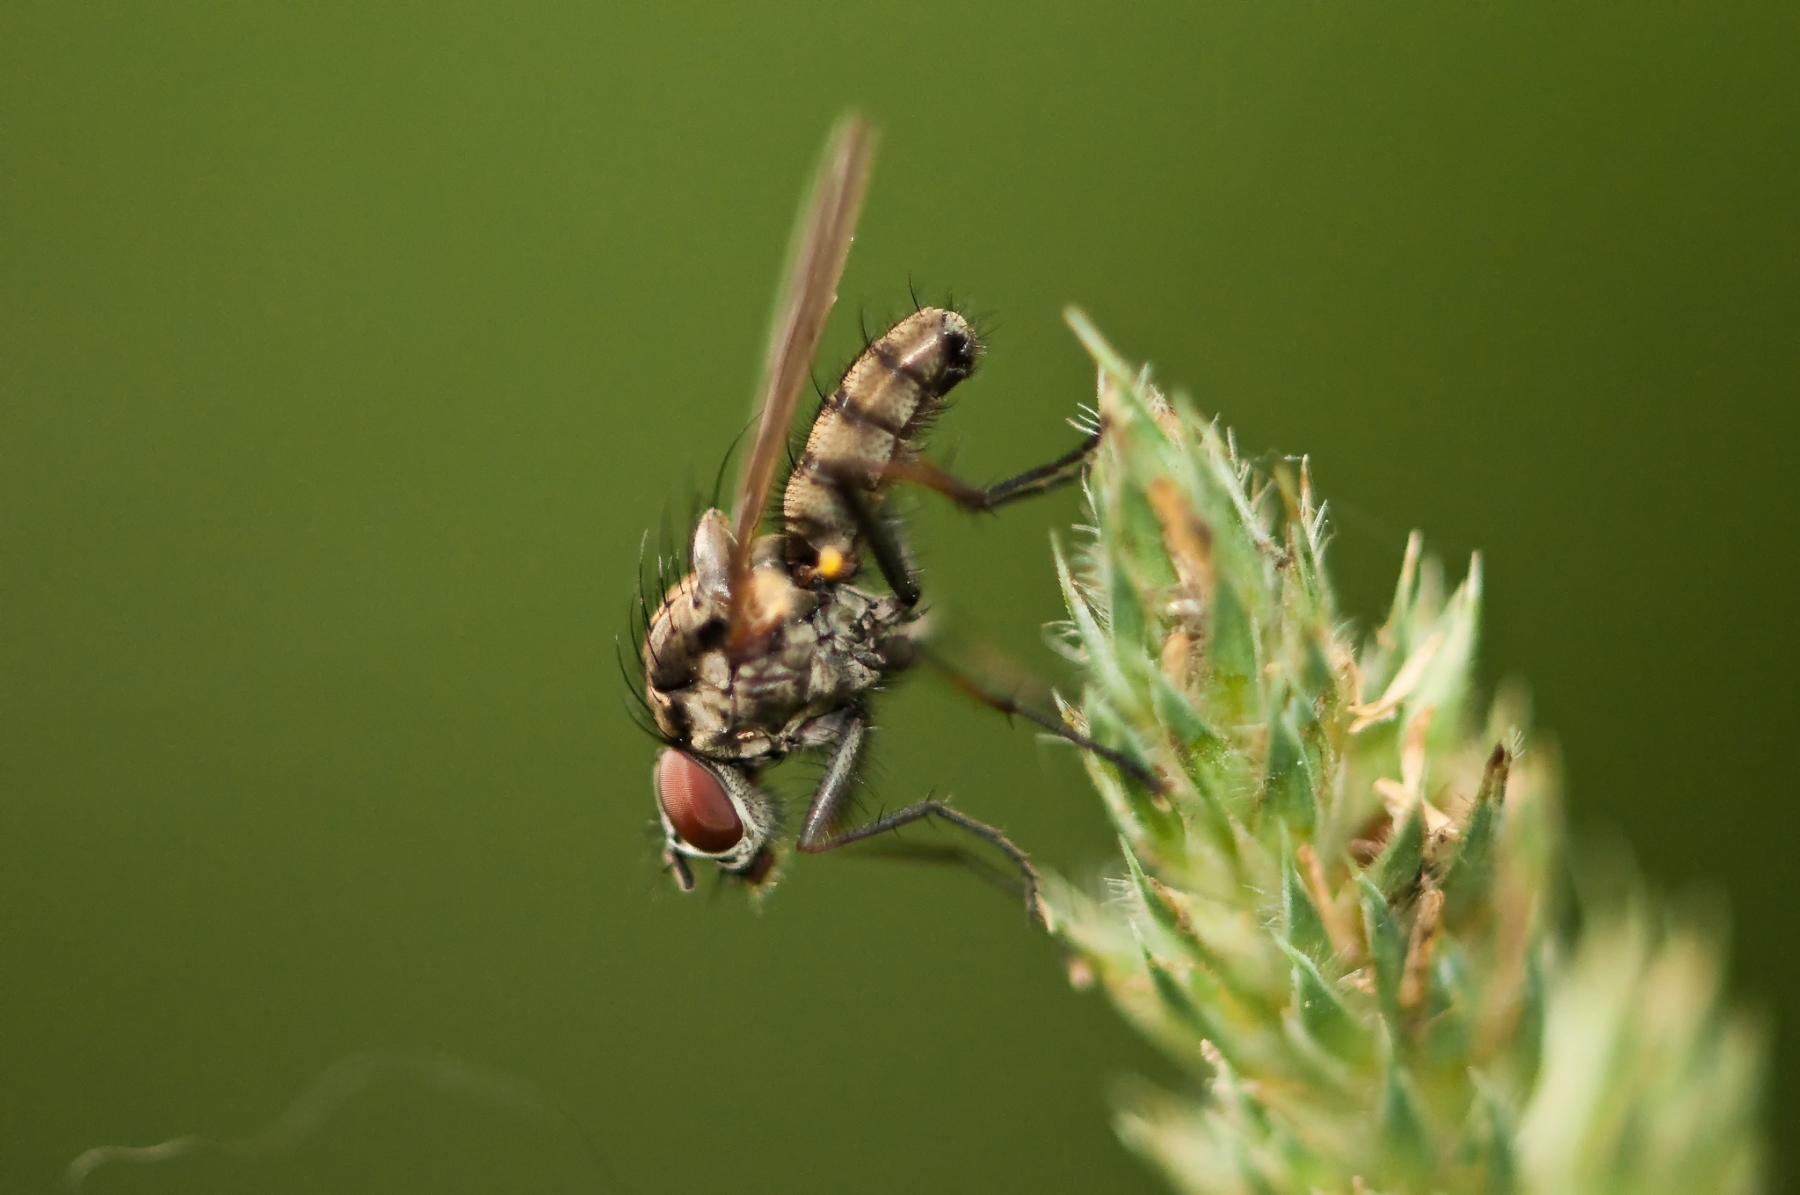 Anthomyiid Fly - Hylemya vagans, Sherwood Forest, Notts